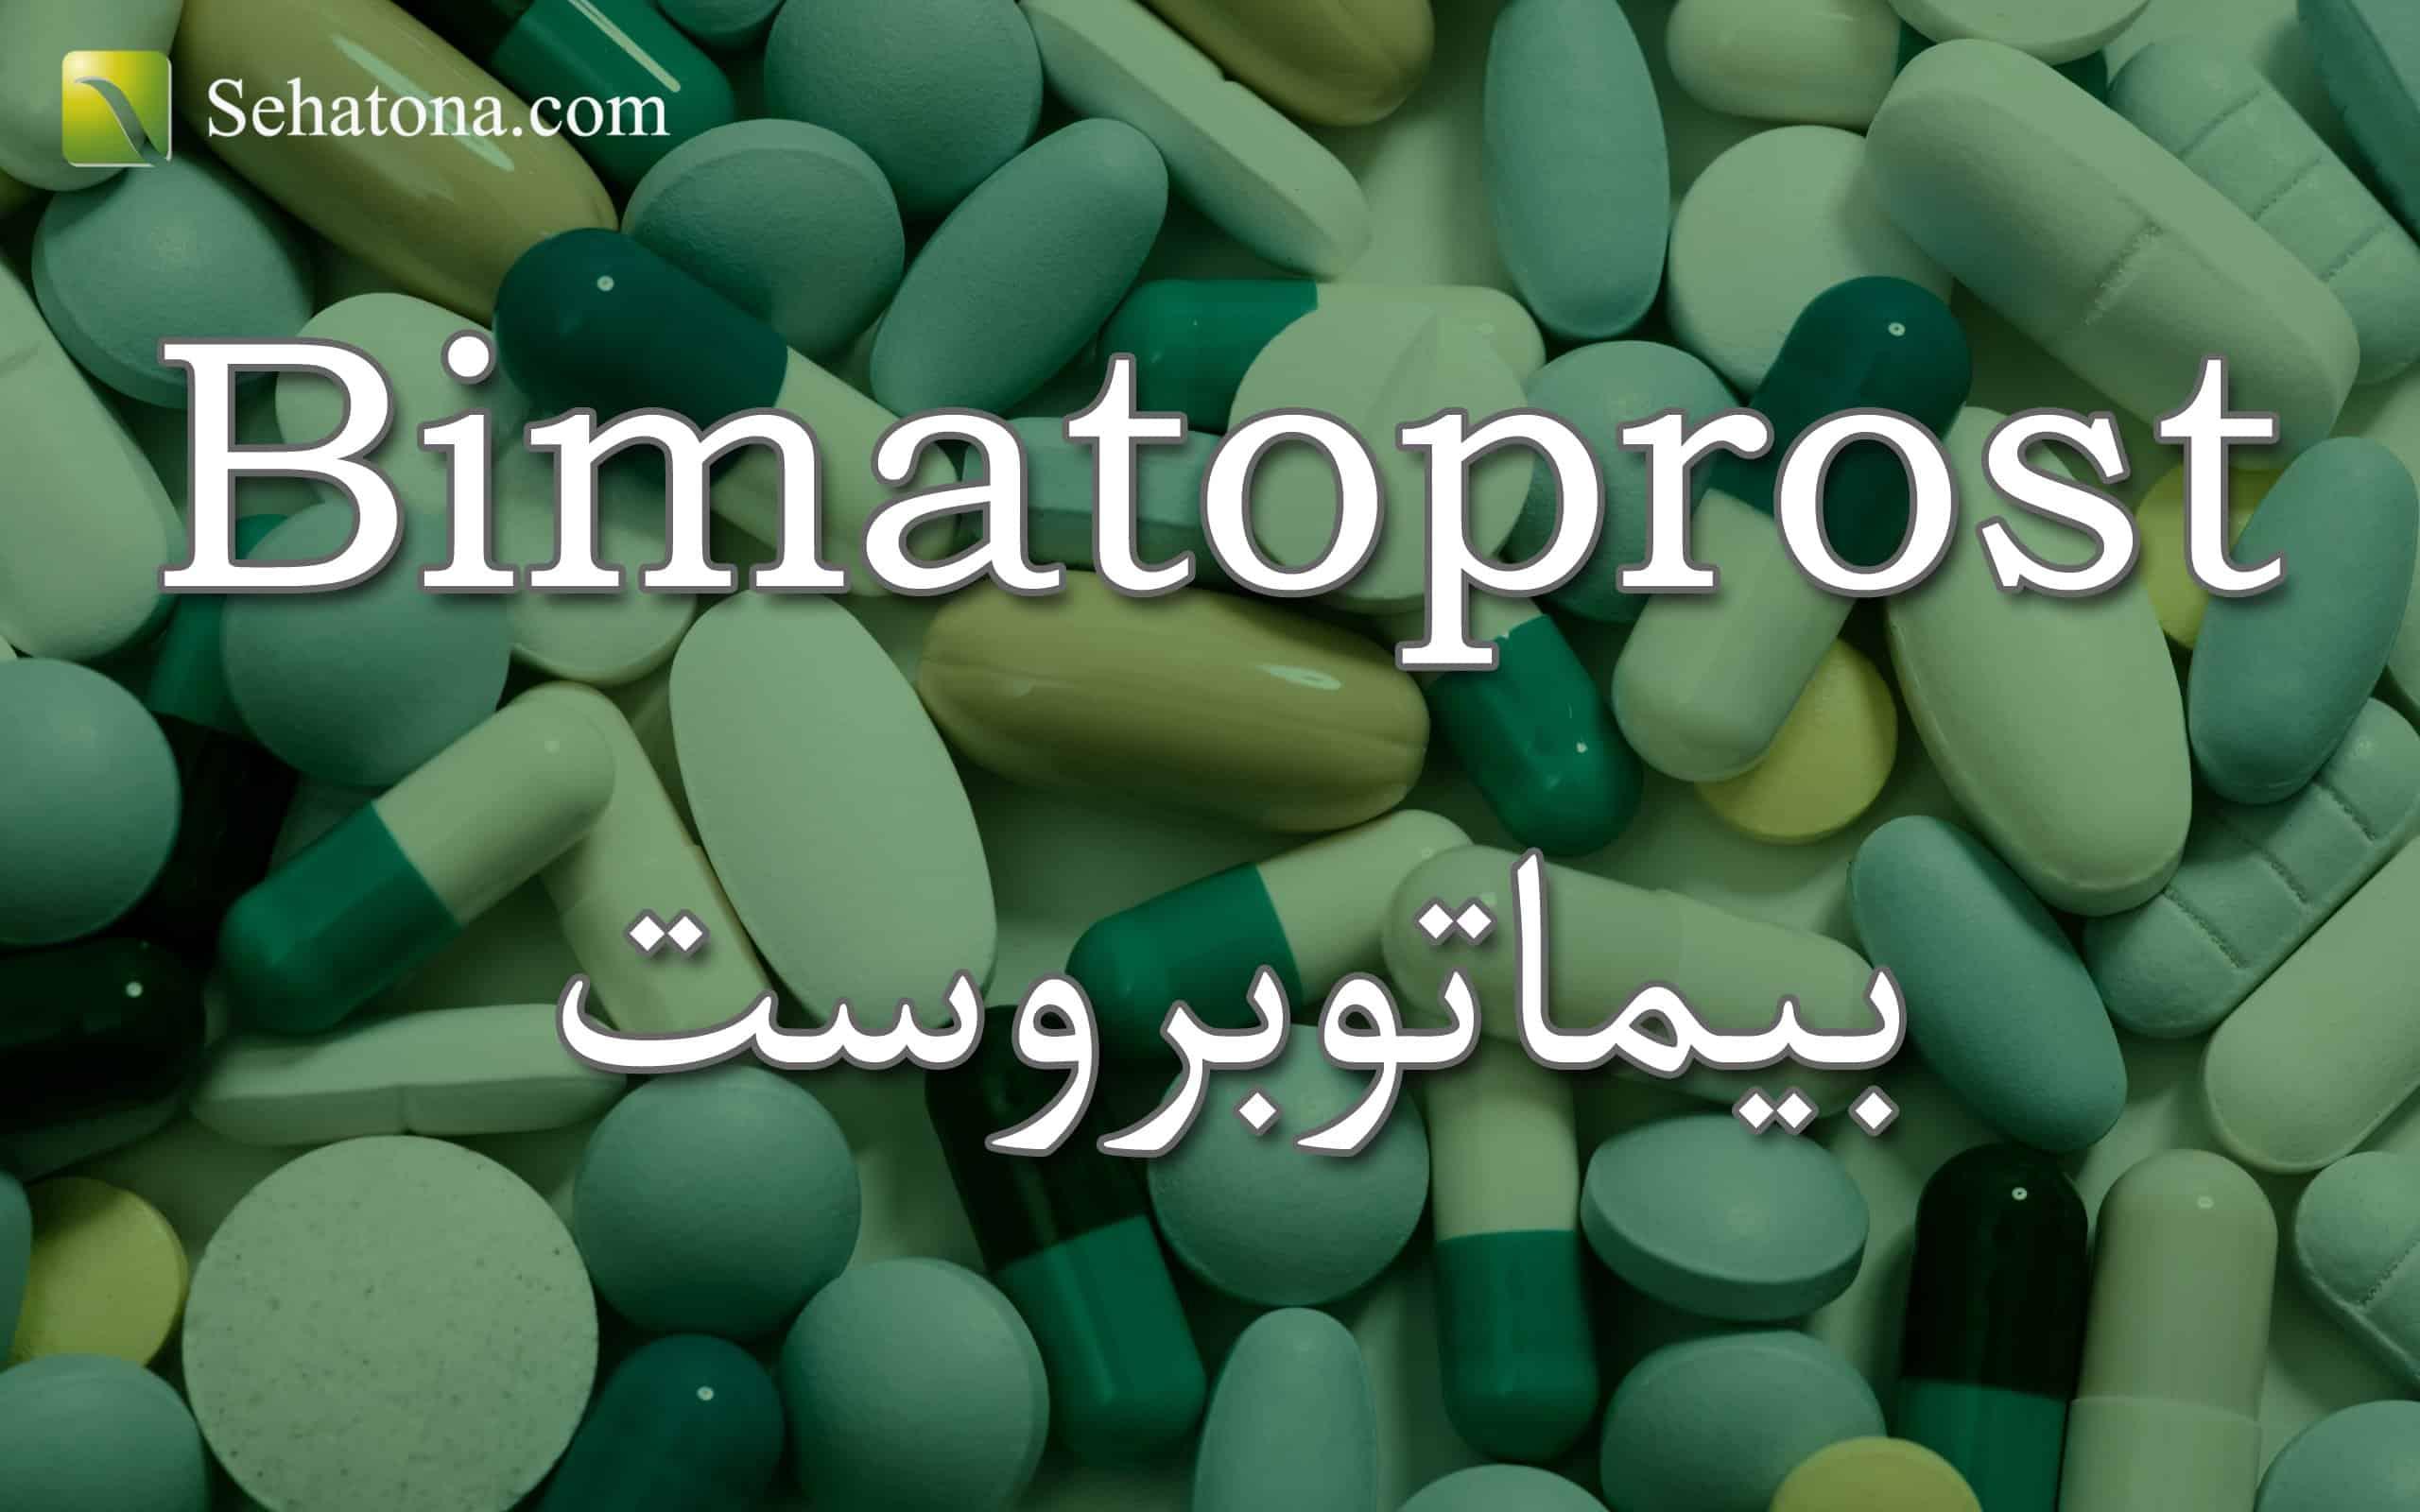 bimatoprost